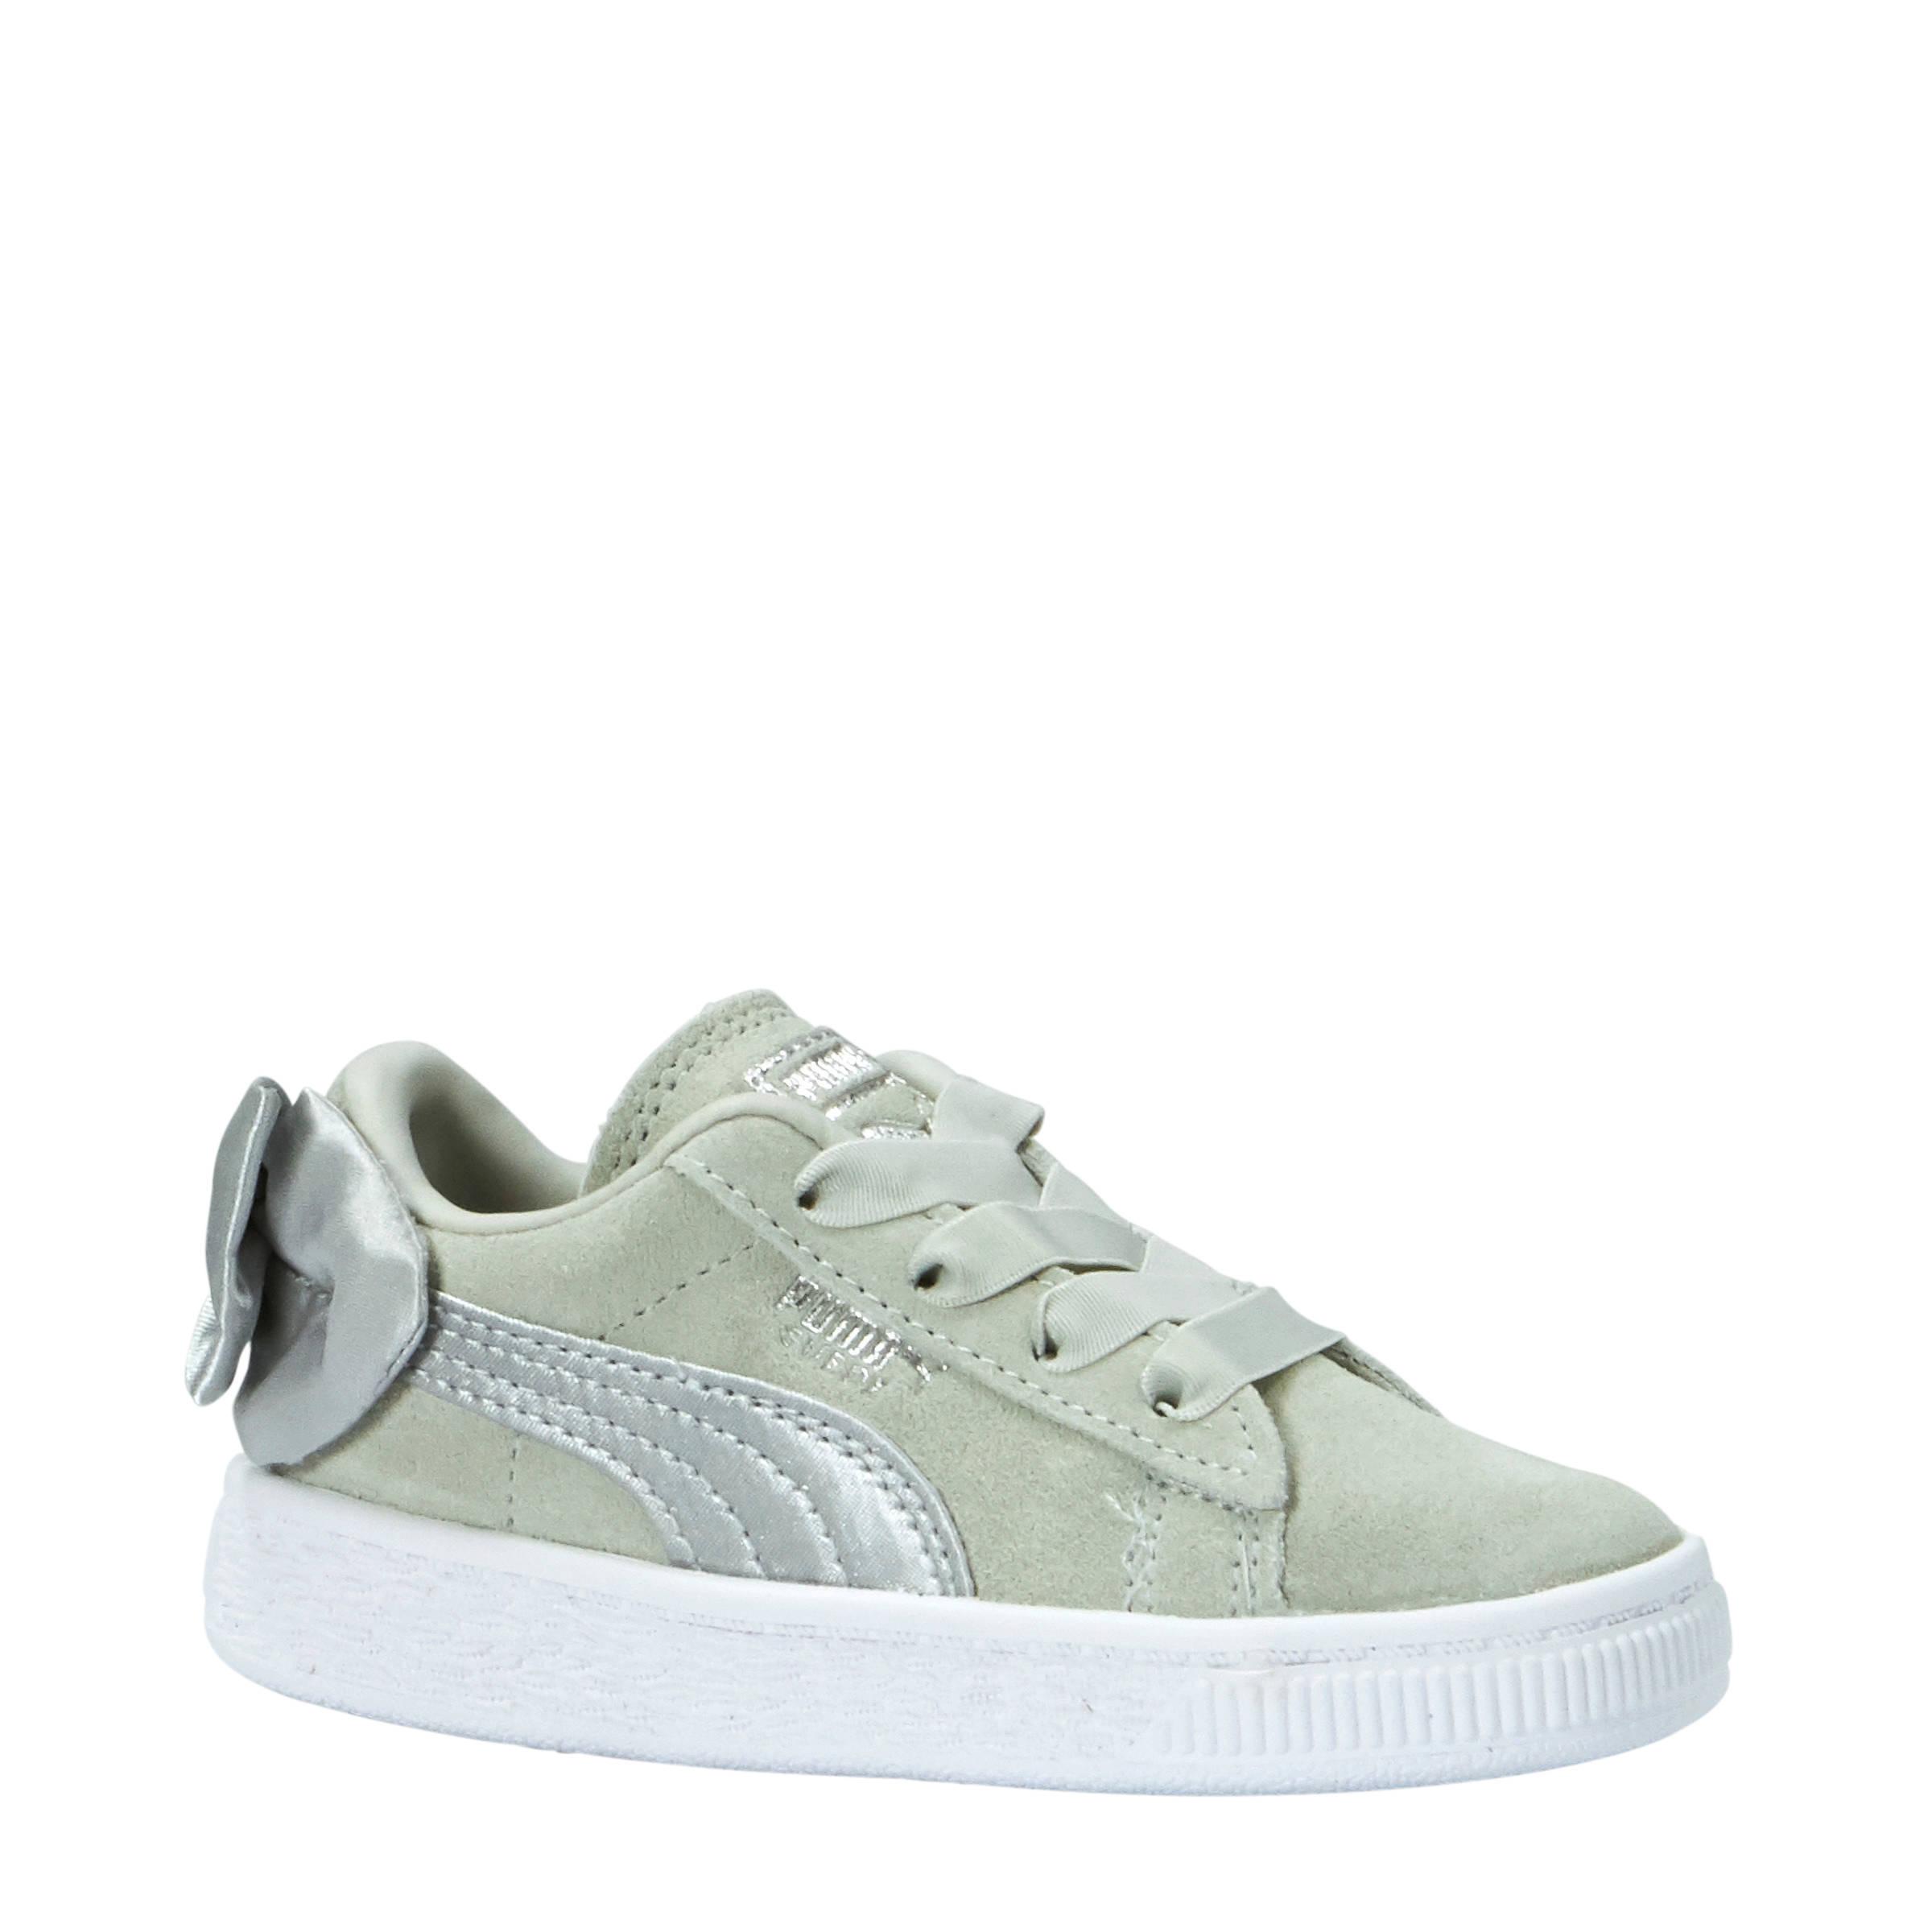 Puma Suède Bow sneakers grijsgroen | wehkamp